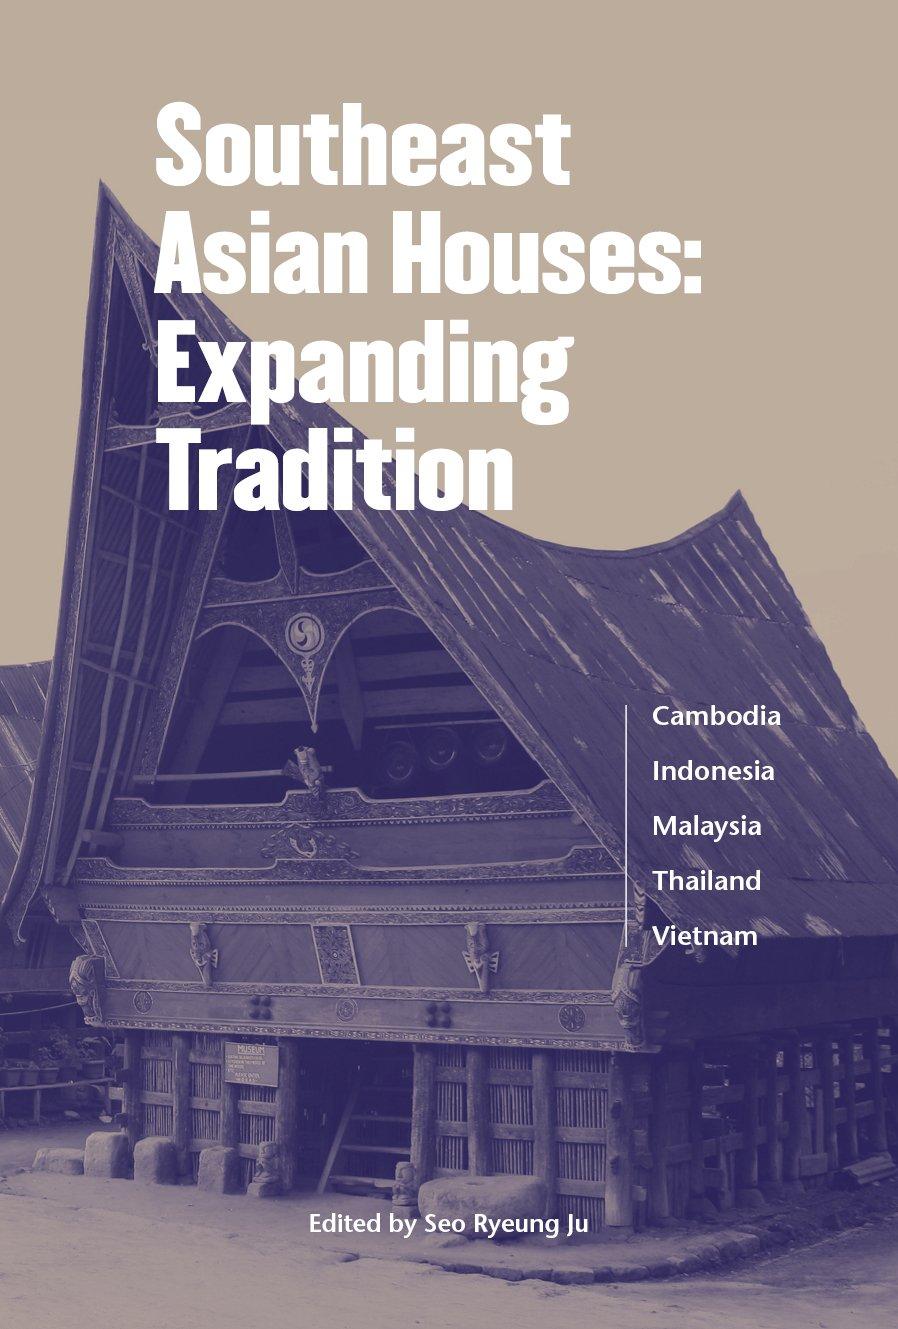 Southeast Asian Houses Expanding Tradition Ju Seo Ryeung Hanan Himasari Ariffin Syed Iskandar Pinijvarasin Wandee Morin Var 9781624120954 Books